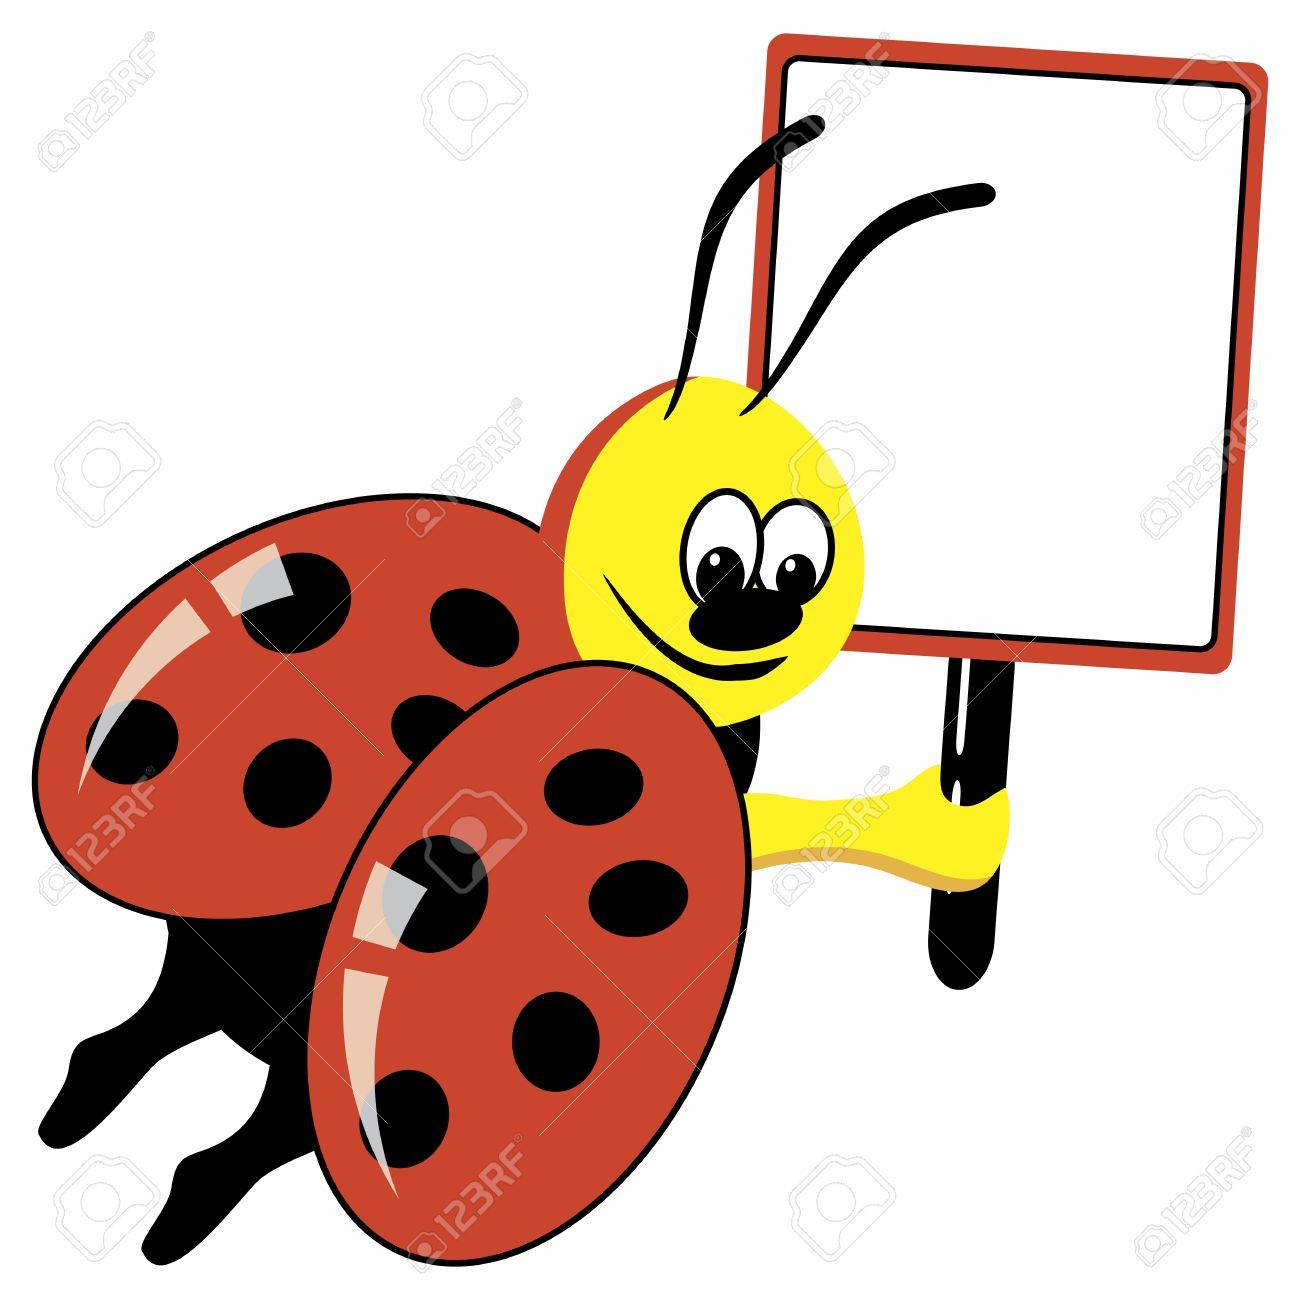 Cartoon ladybird with speech bubble Stock Vector - 9847705